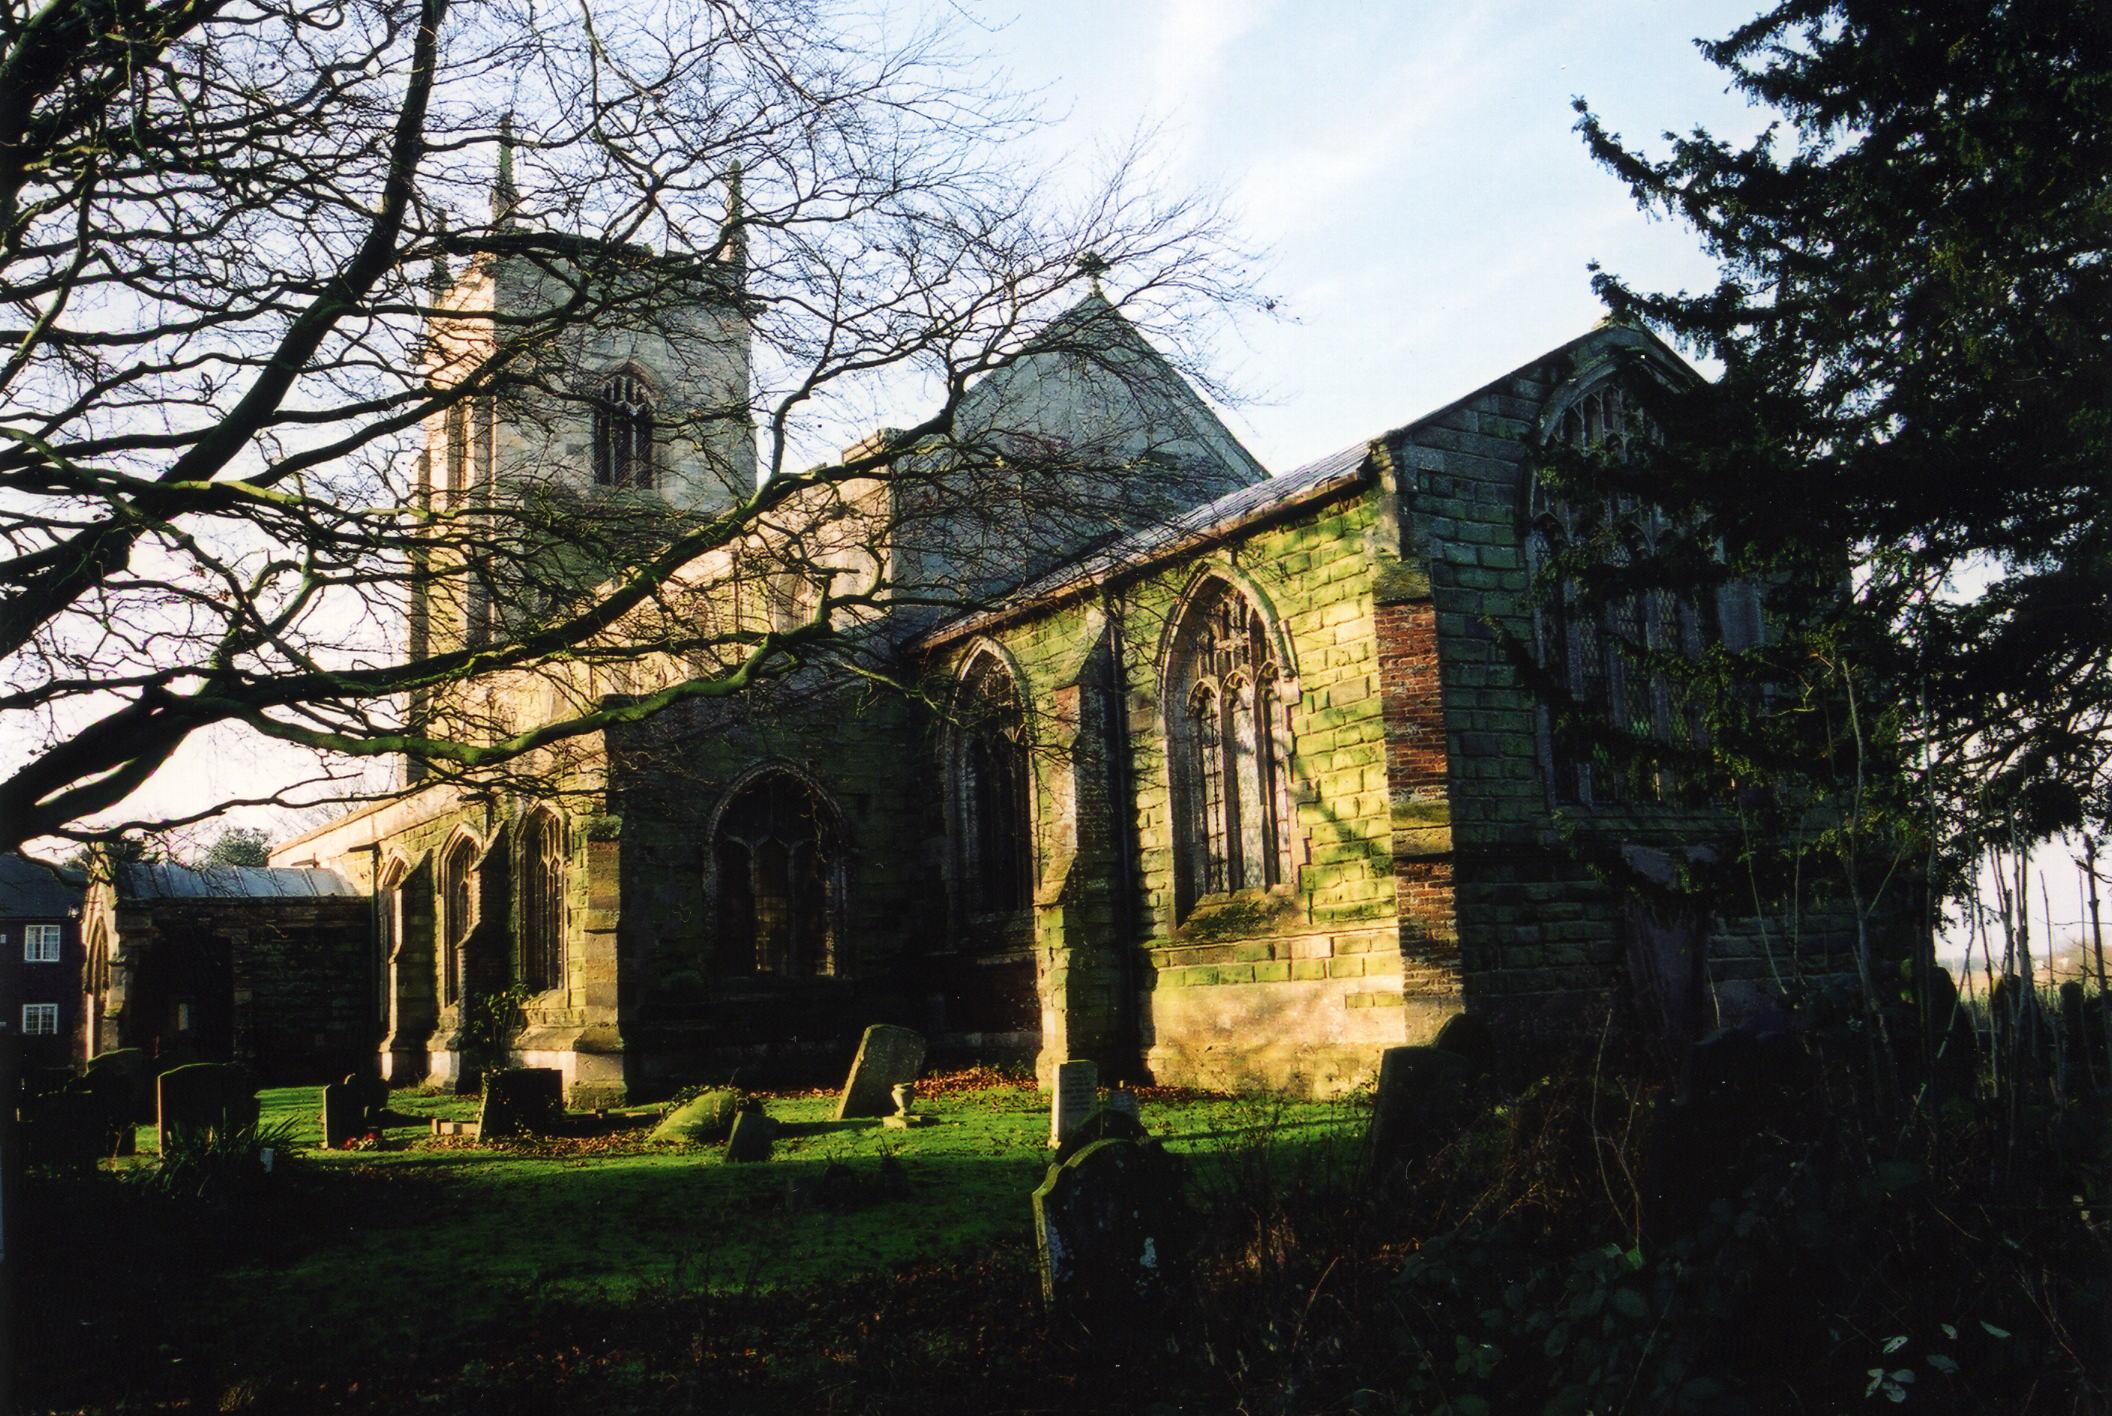 Croft All Saints parish church